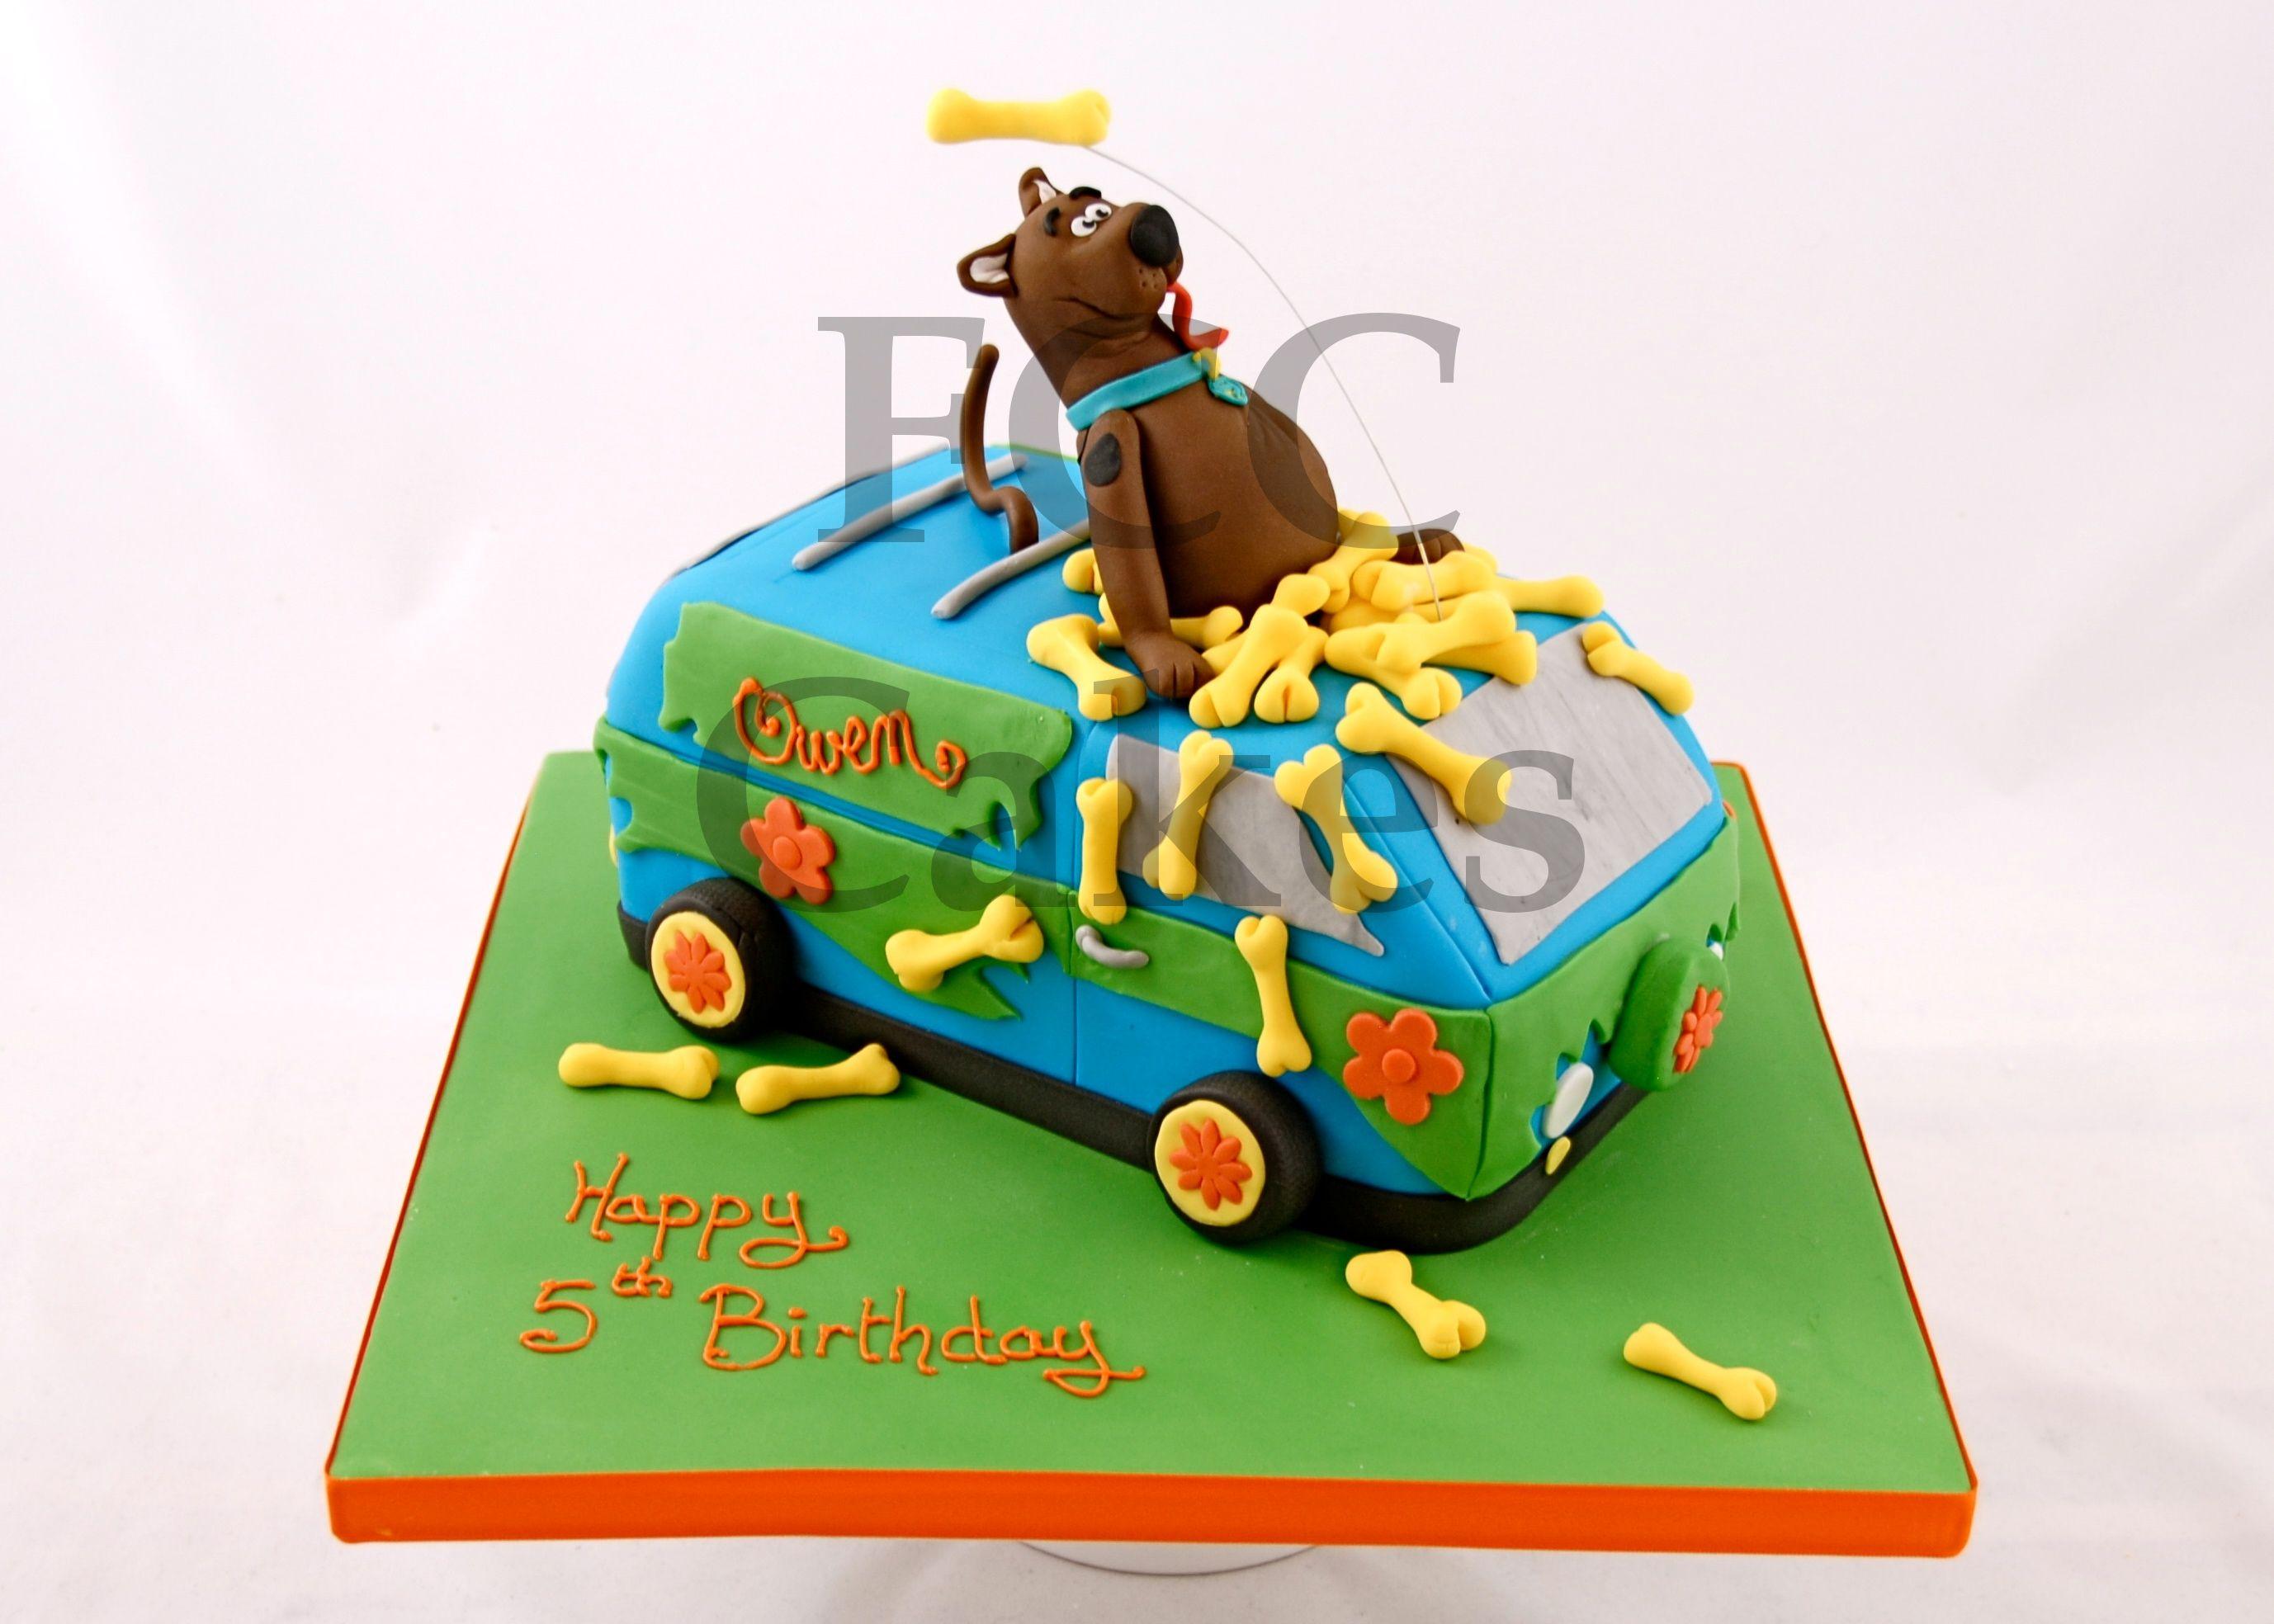 cake for boys scoubidou gateau d 39 anniversaire pour enfants garcon scoubidou verjaardagstaart. Black Bedroom Furniture Sets. Home Design Ideas